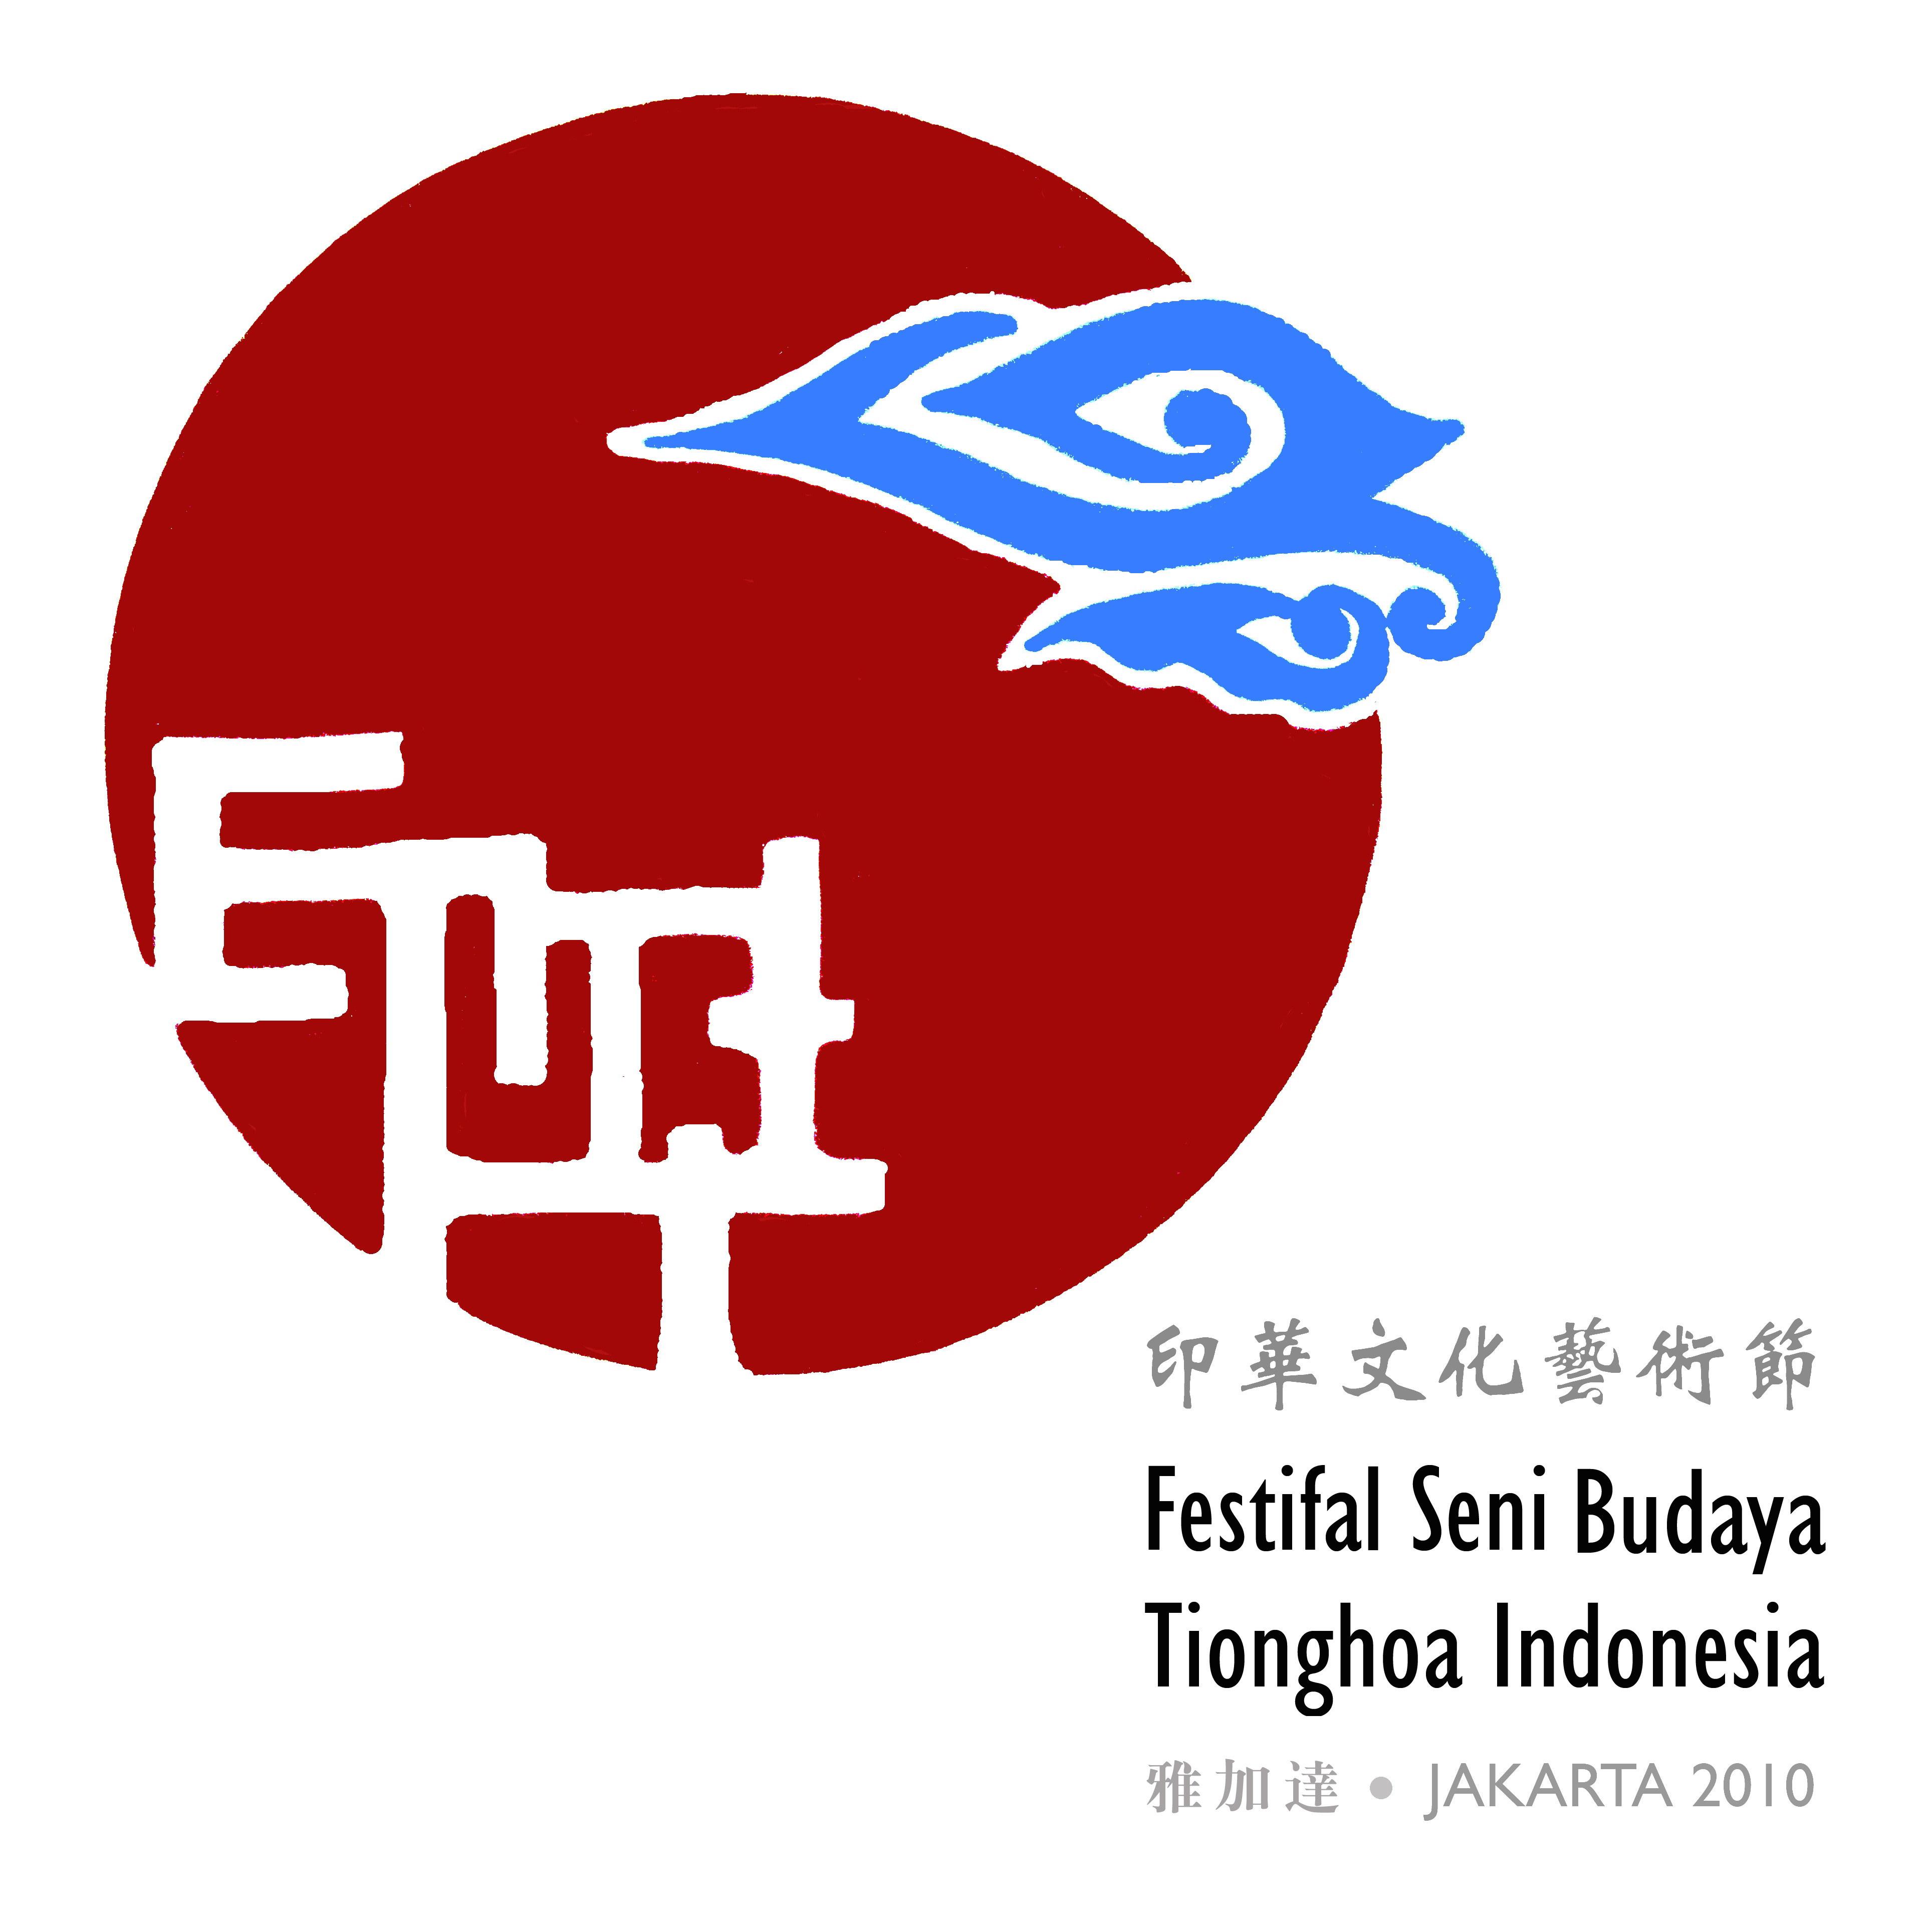 ... KEBERAGAMAN Festival Seni Budaya Tionghoa-Indonesia   Blog Bookoopedia